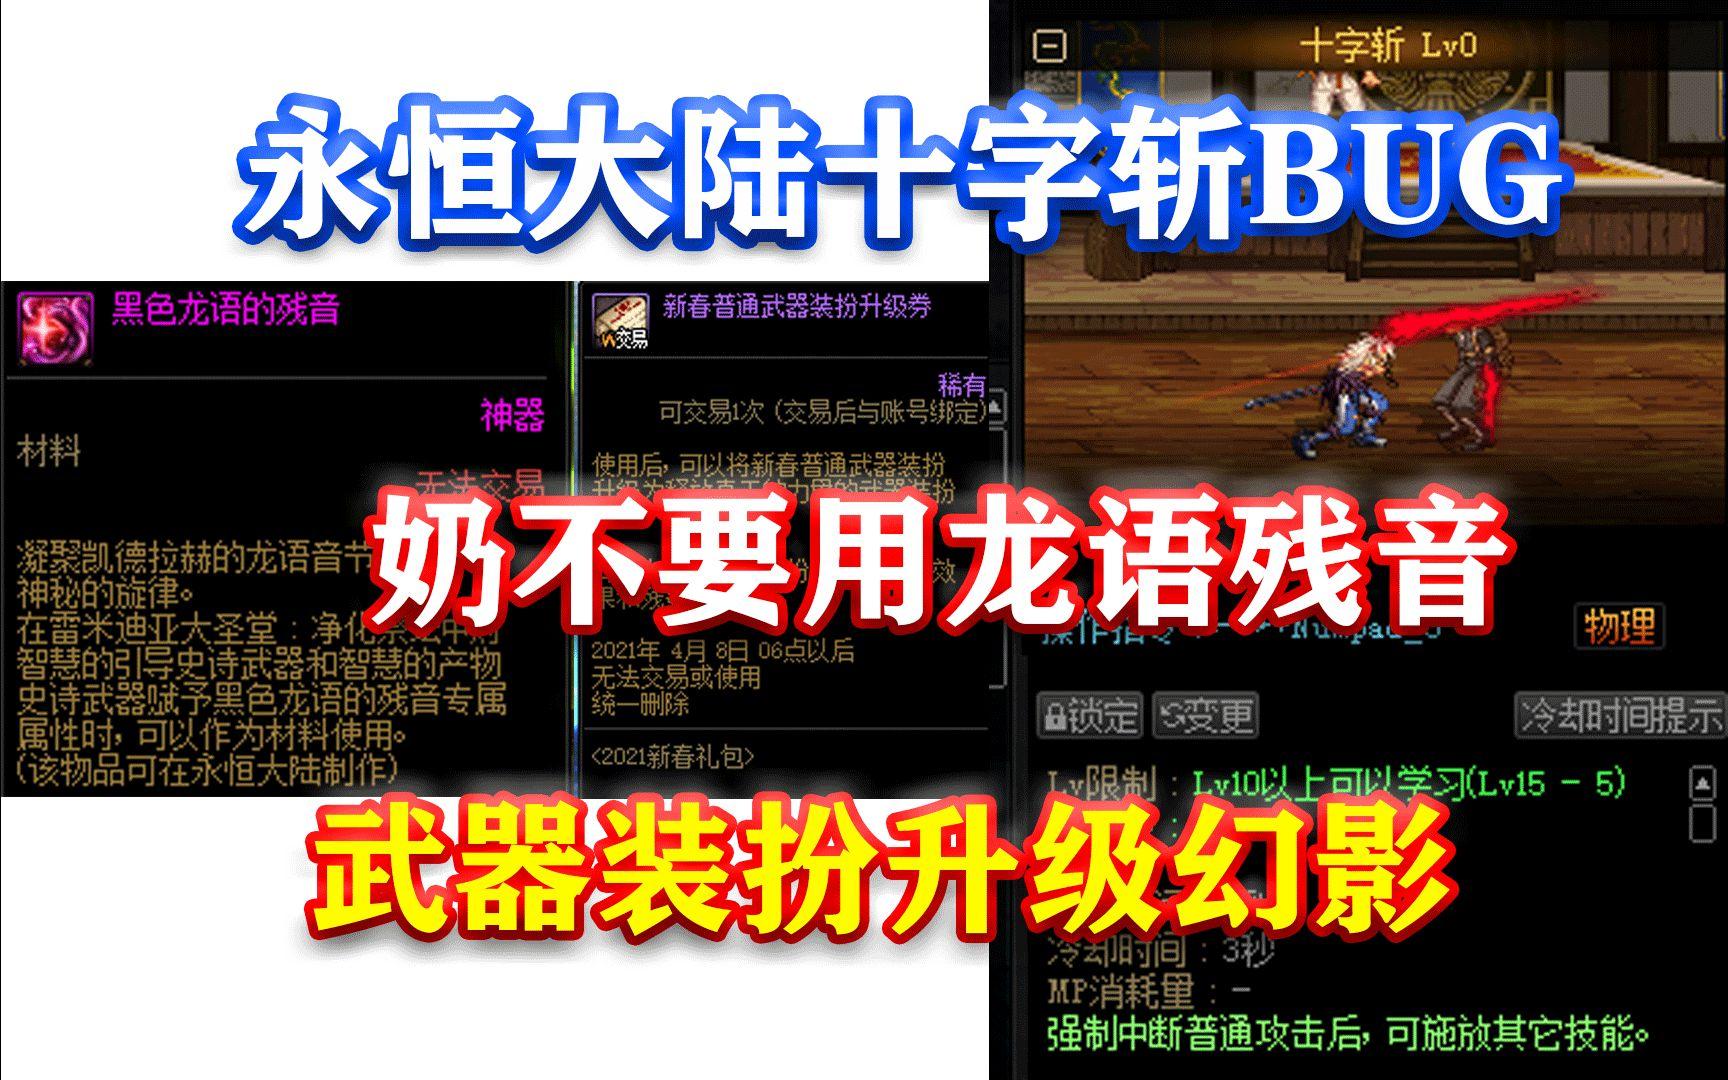 DNF: 永恒大陆十字斩BUG! 奶不要用龙语残音! 武器装扮升级幻影!